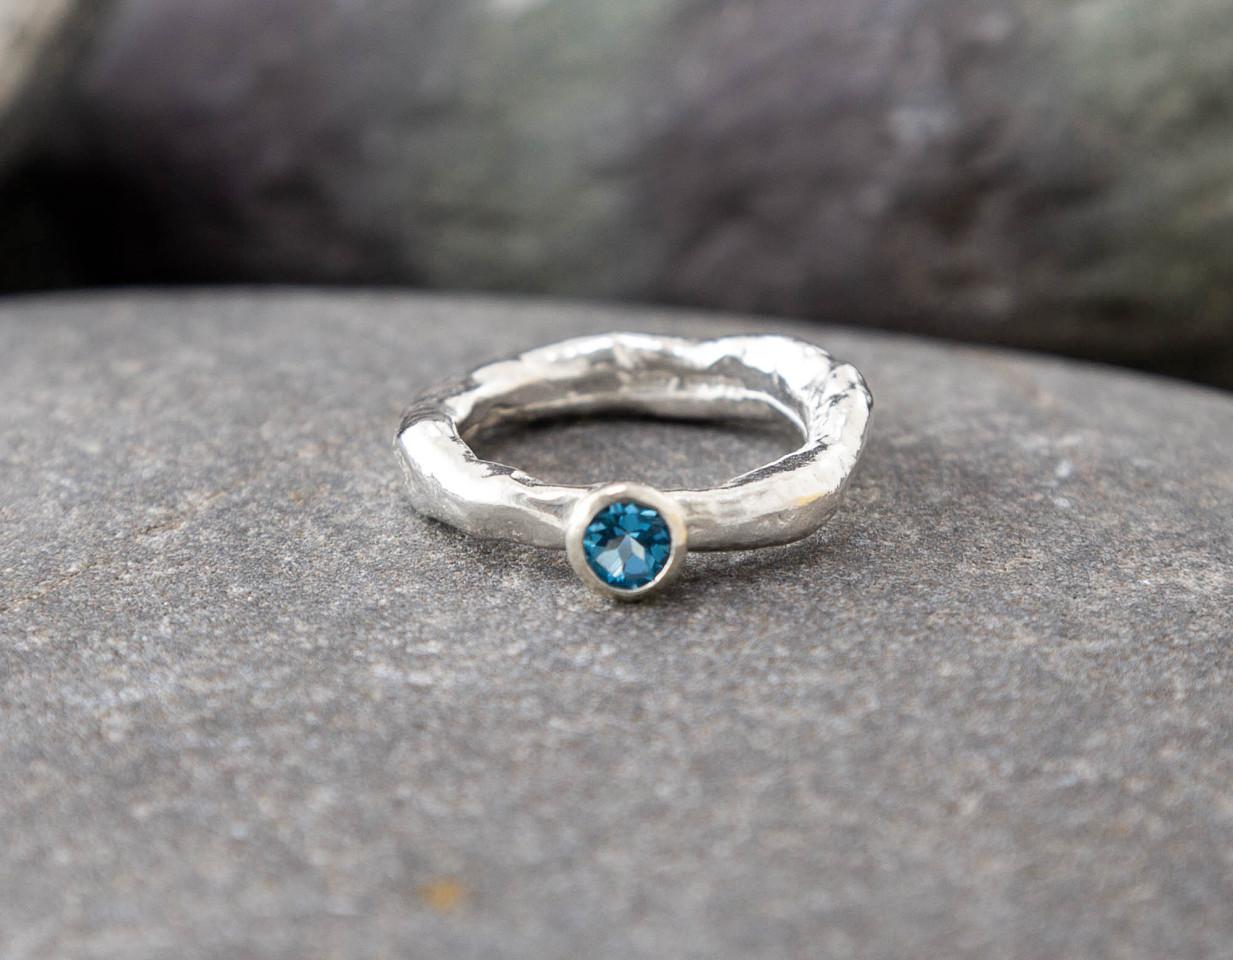 Marsha Drew, Rockpool Rustic Ring with small Swiss Blue Topaz